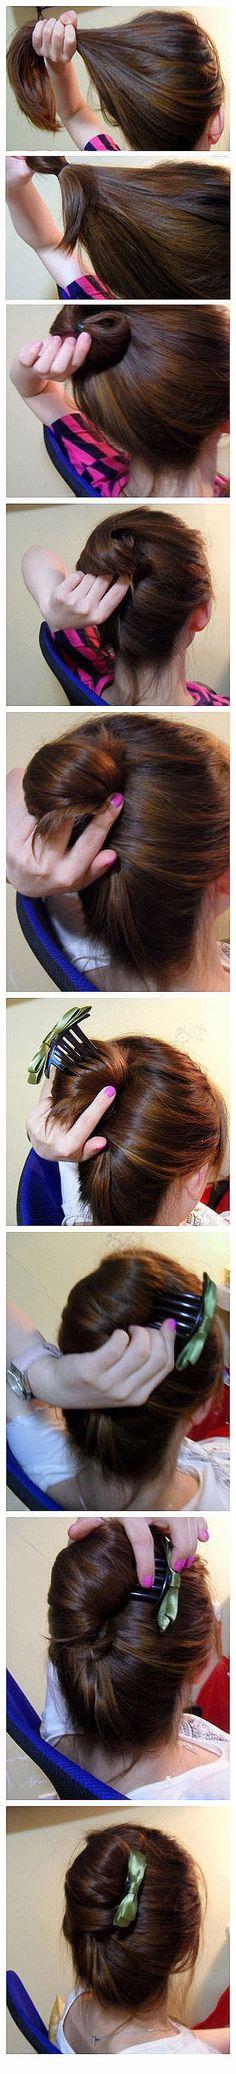 french twist with a bow hair-hair-hair-hair-hair Up Hairstyles, Pretty Hairstyles, Banana Clip Hairstyles, Style Hairstyle, Everyday Hairstyles, Wedding Hairstyles, Tips Belleza, Great Hair, Hair Today